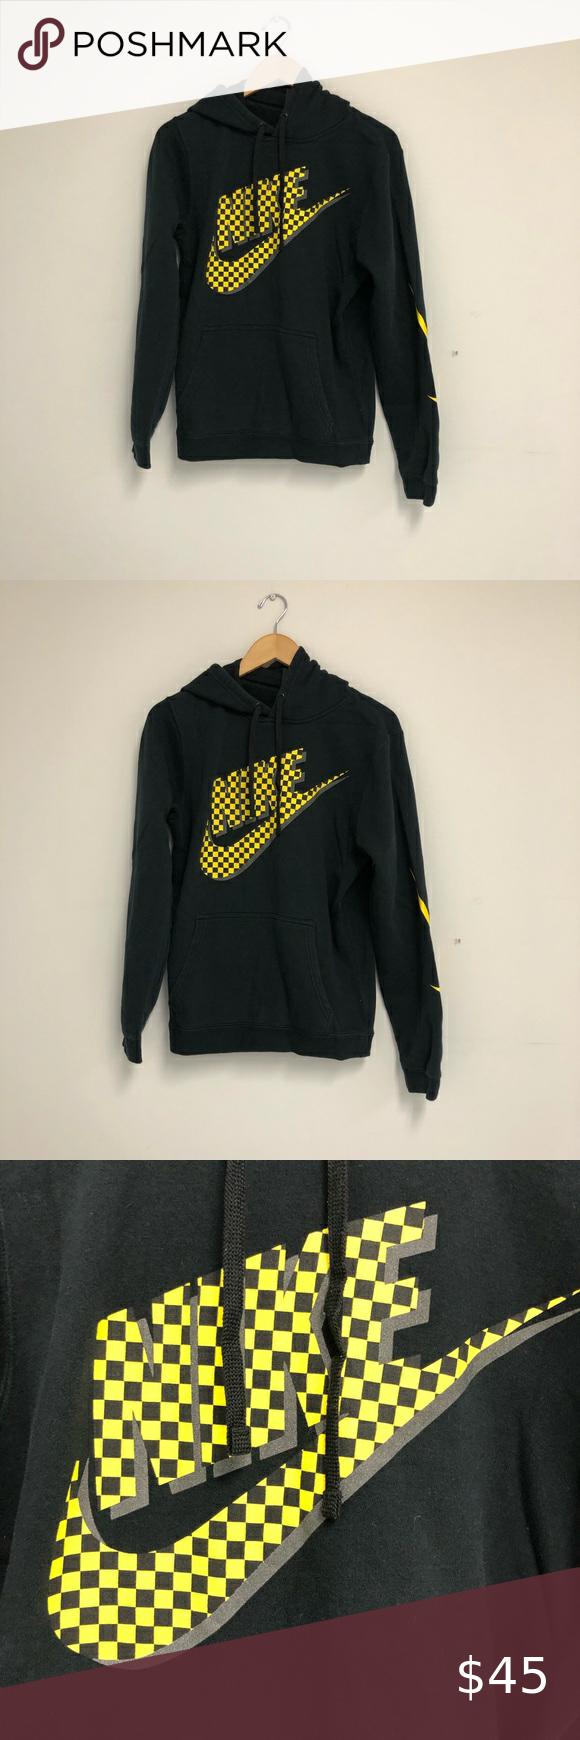 Nike Checkerboard Logo Hoodie Nike Checkerboard Logo Hoodie Size Small Good Used Condition Nike Shirts Sweatshirts Hoodi Sweatshirt Shirt Hoodies Nike Shirts [ 1740 x 580 Pixel ]